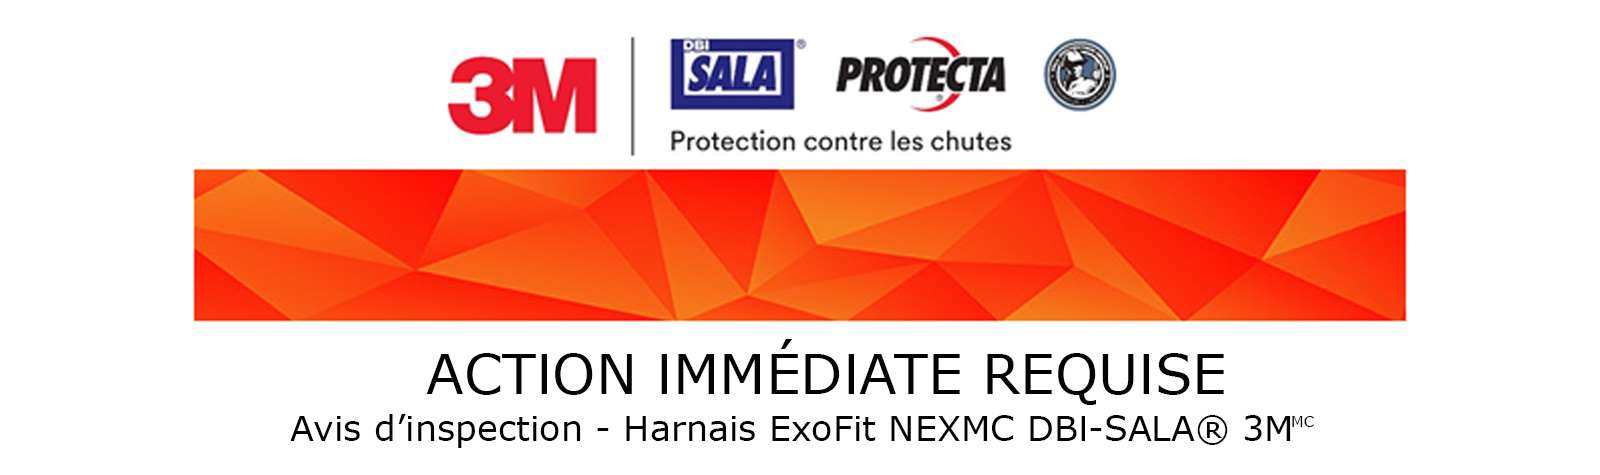 ACTION IMMÉDIATE REQUISE  – Avis d'inspection – Harnais ExoFit NEXMC DBI-SALA® 3M